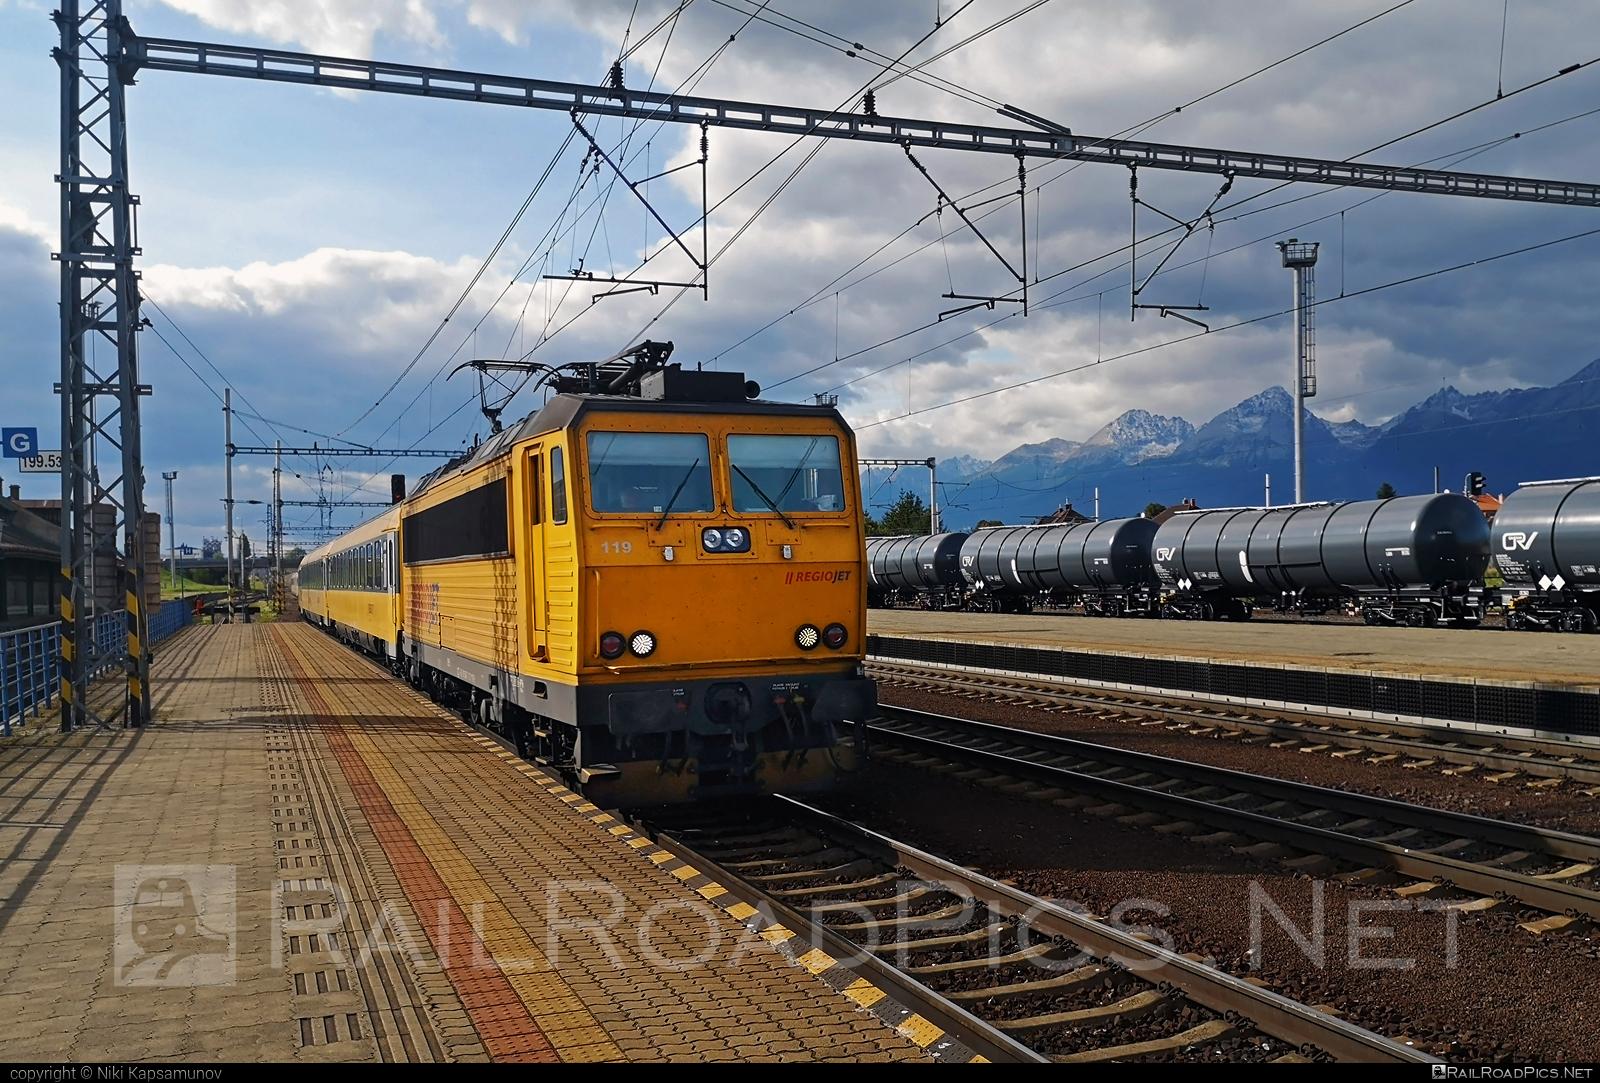 Škoda 99E - 162 119-2 operated by RegioJet, a.s. #e4993 #locomotive163 #regiojet #skoda #skoda99e